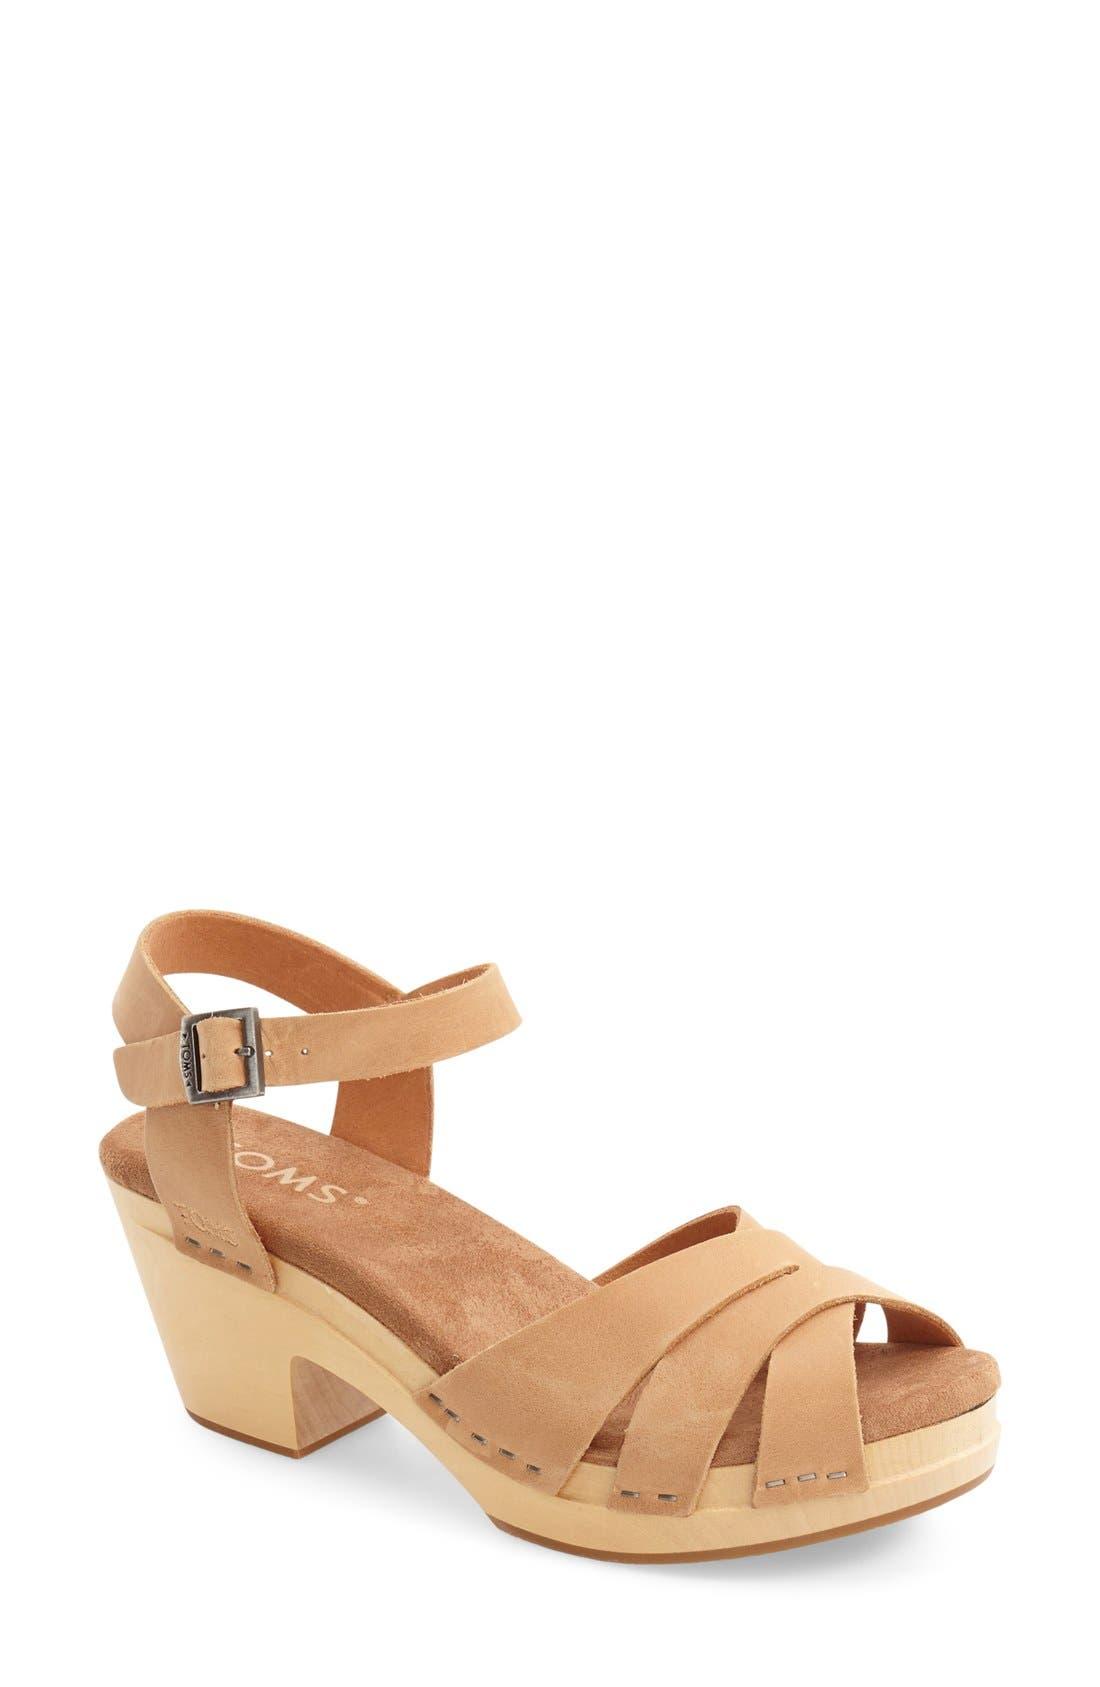 Main Image - TOMS 'Beatrix' Leather Sandal (Women)